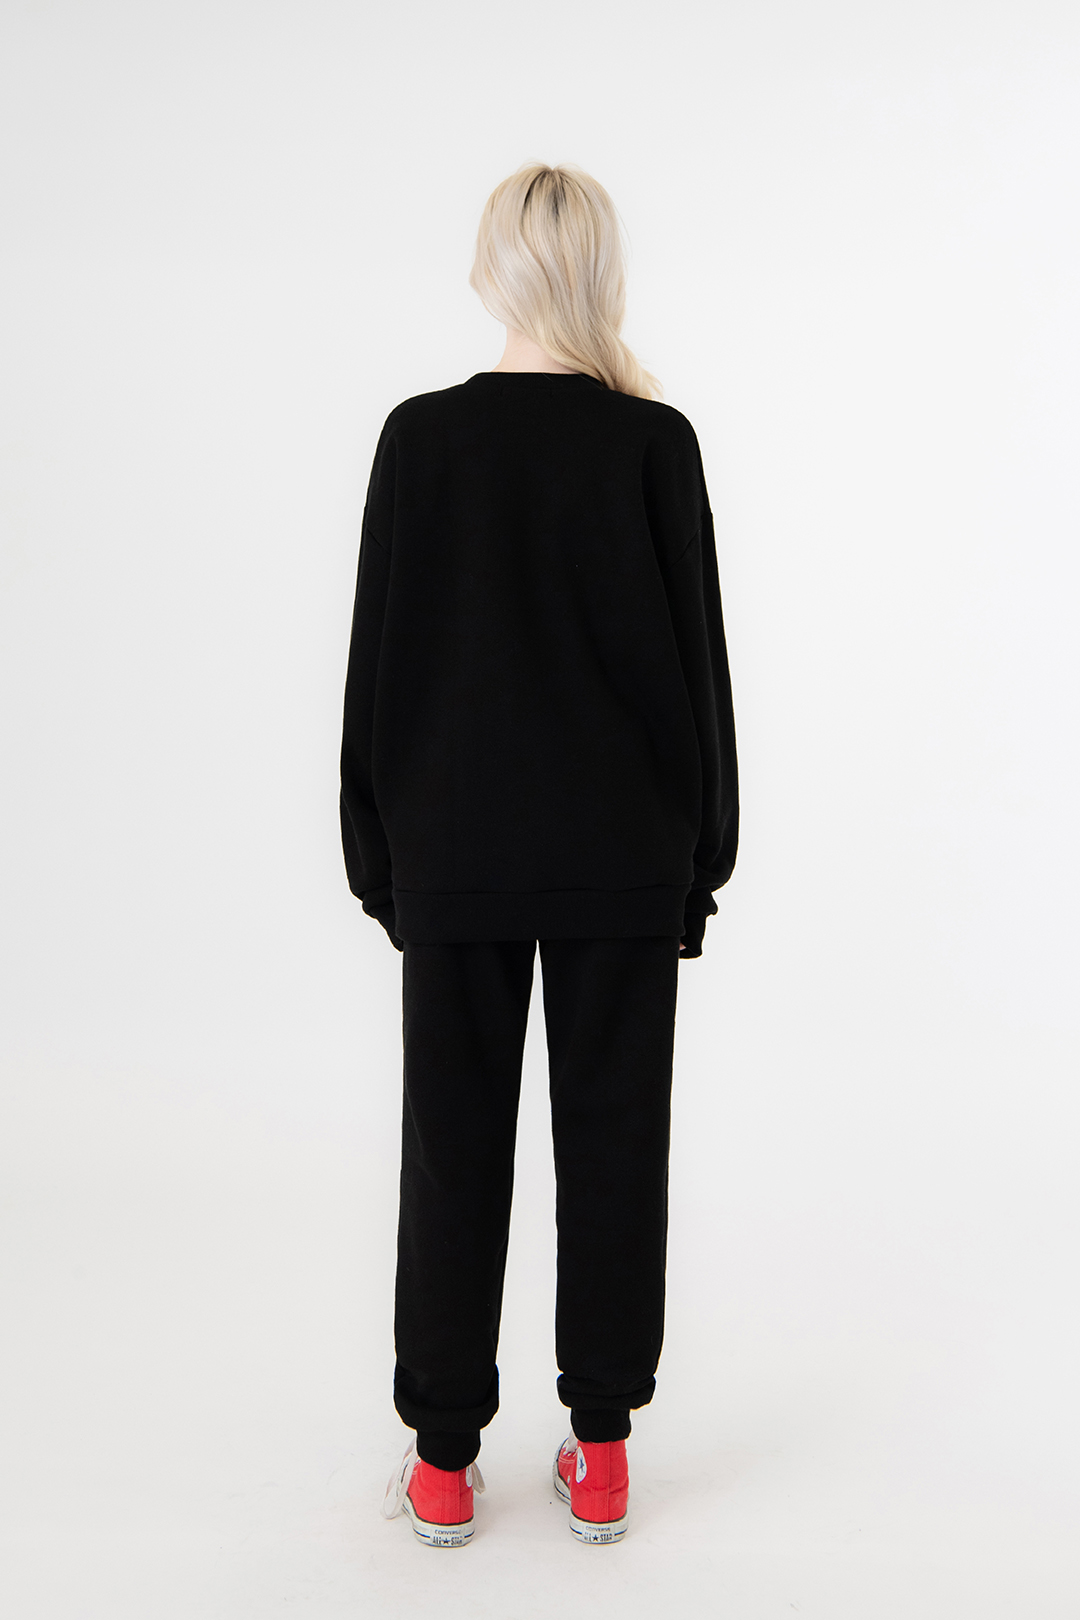 UT8 Street Long Pants